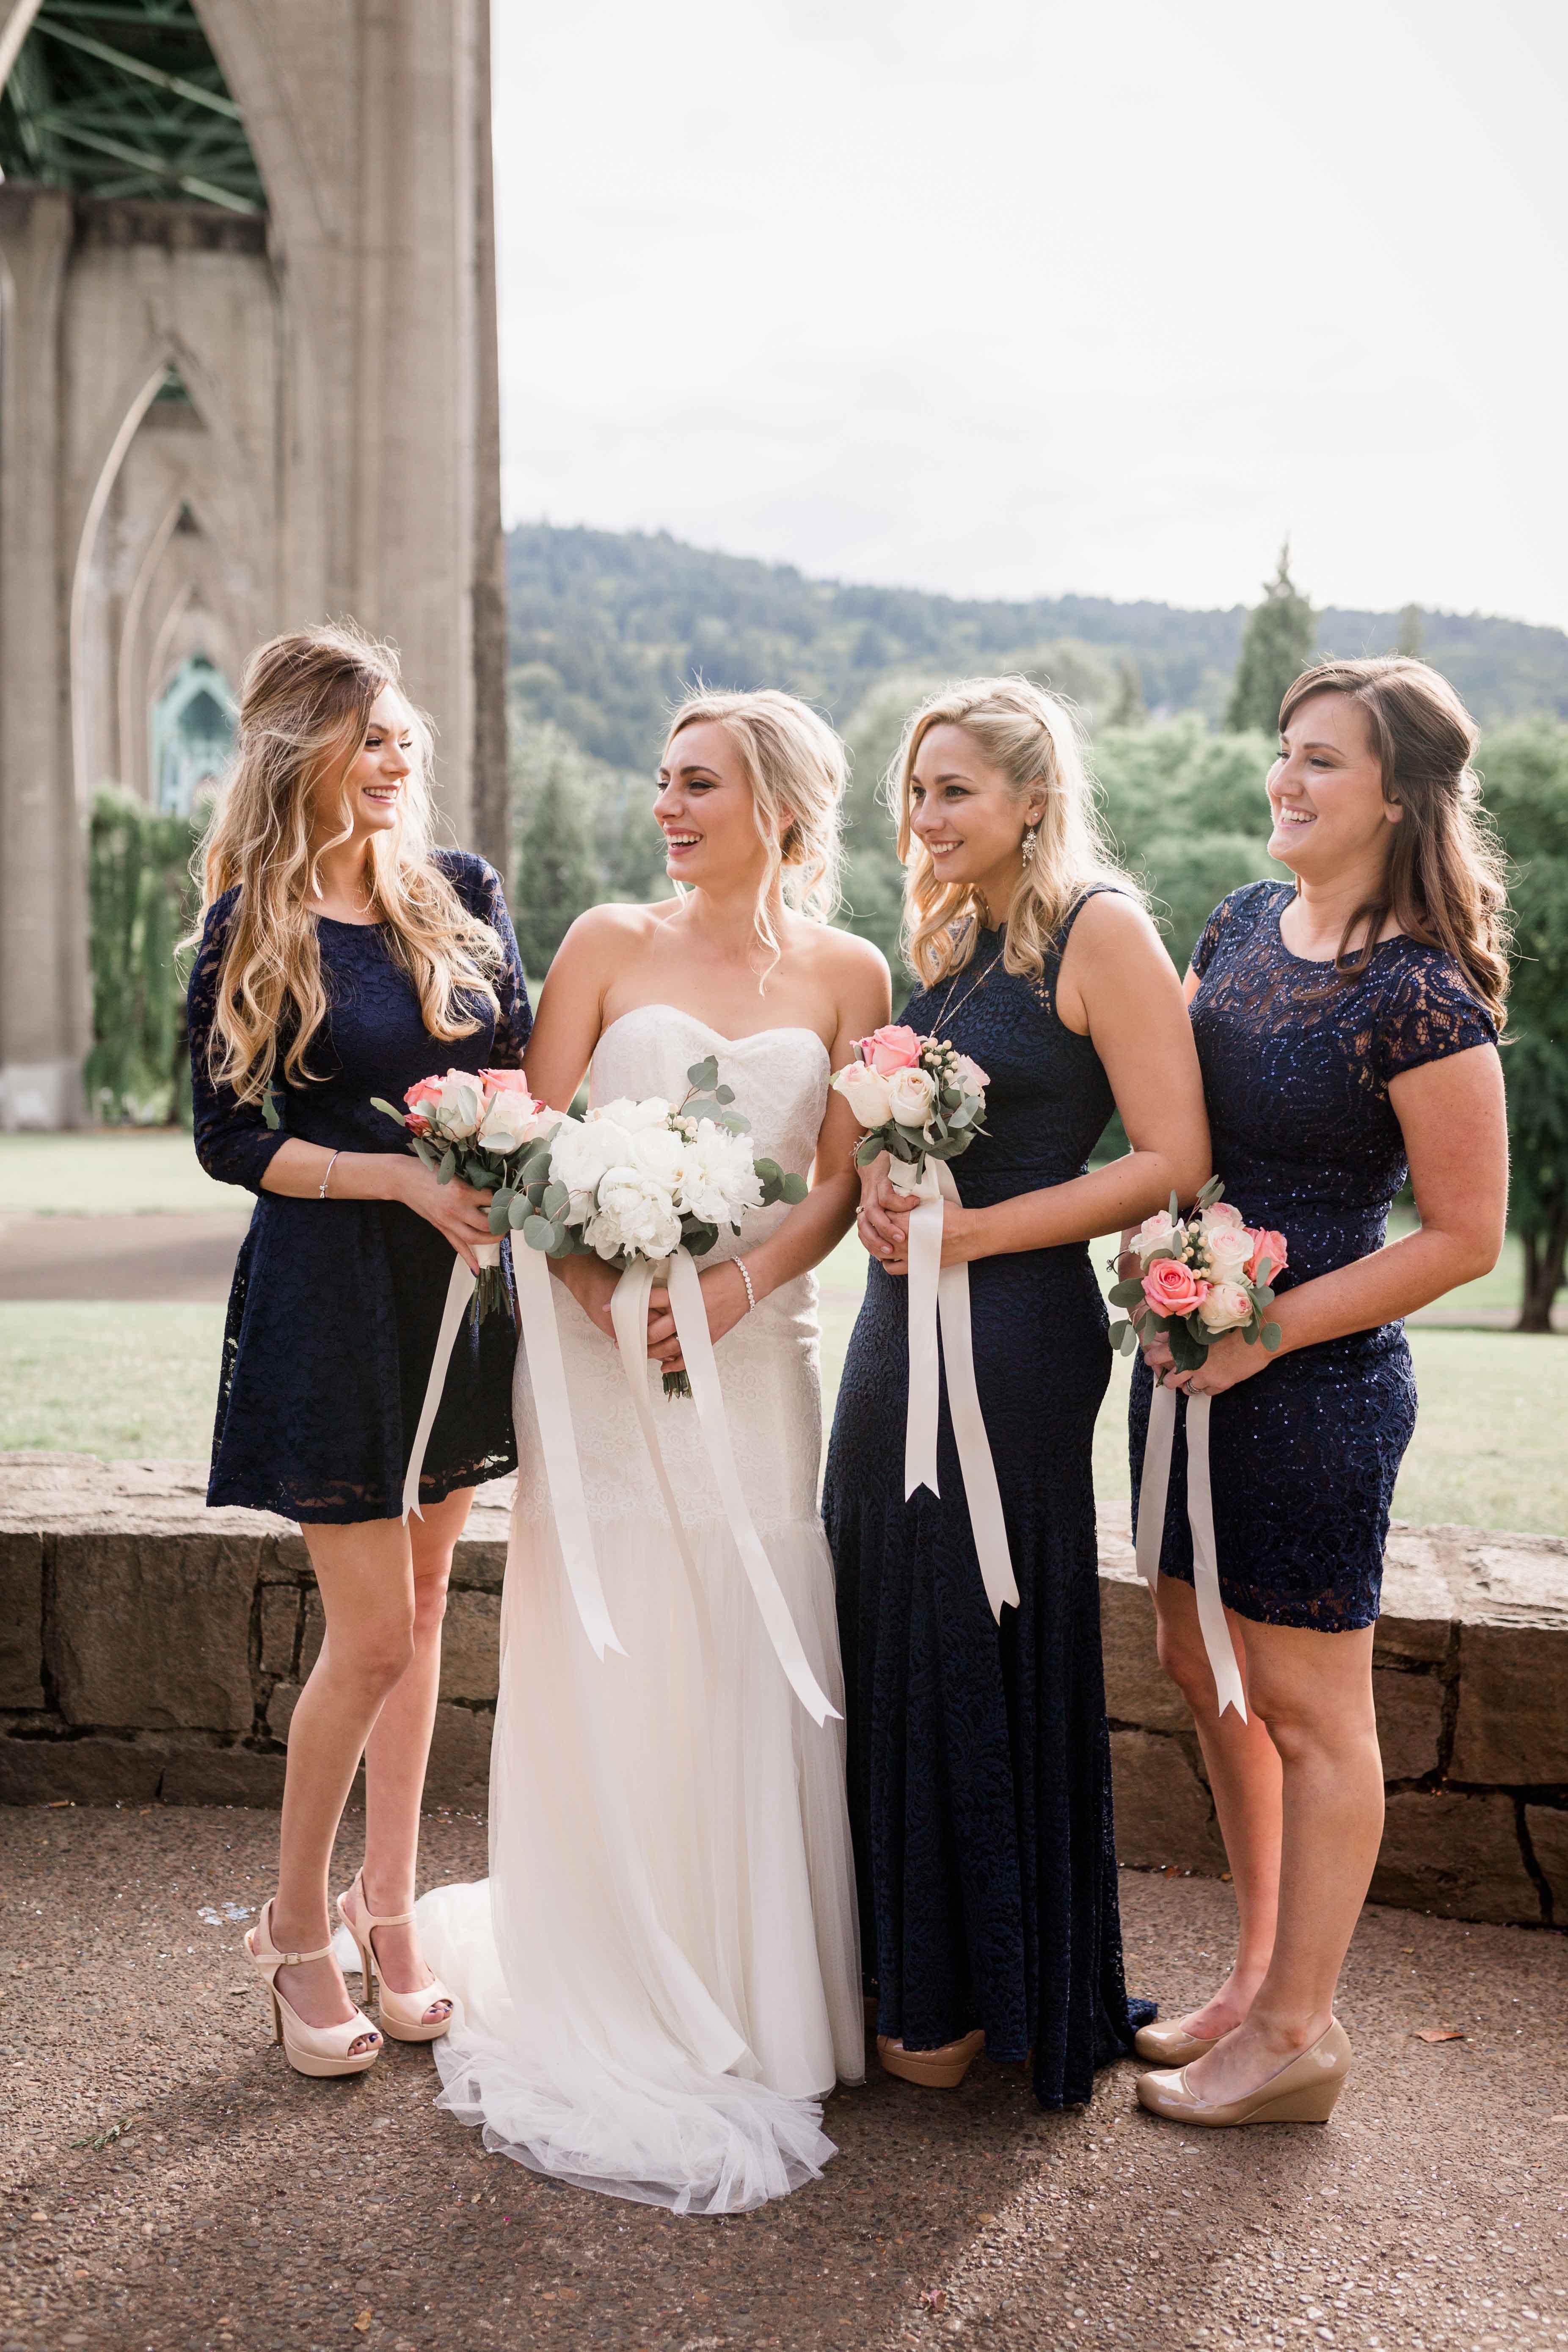 6 different bridesmaid dress